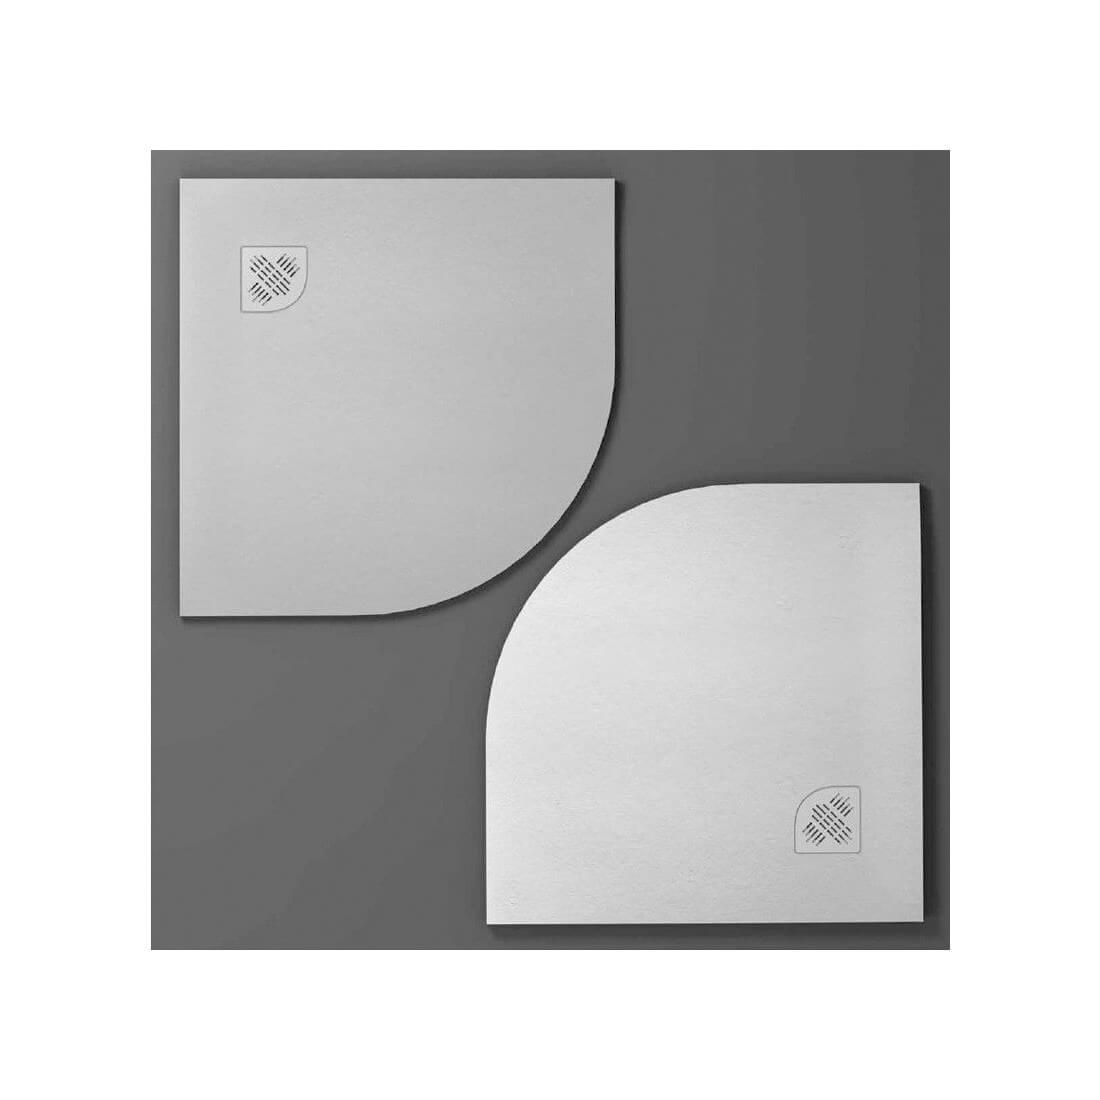 Comprar plato ducha de resina angular for Instalar plato ducha resina